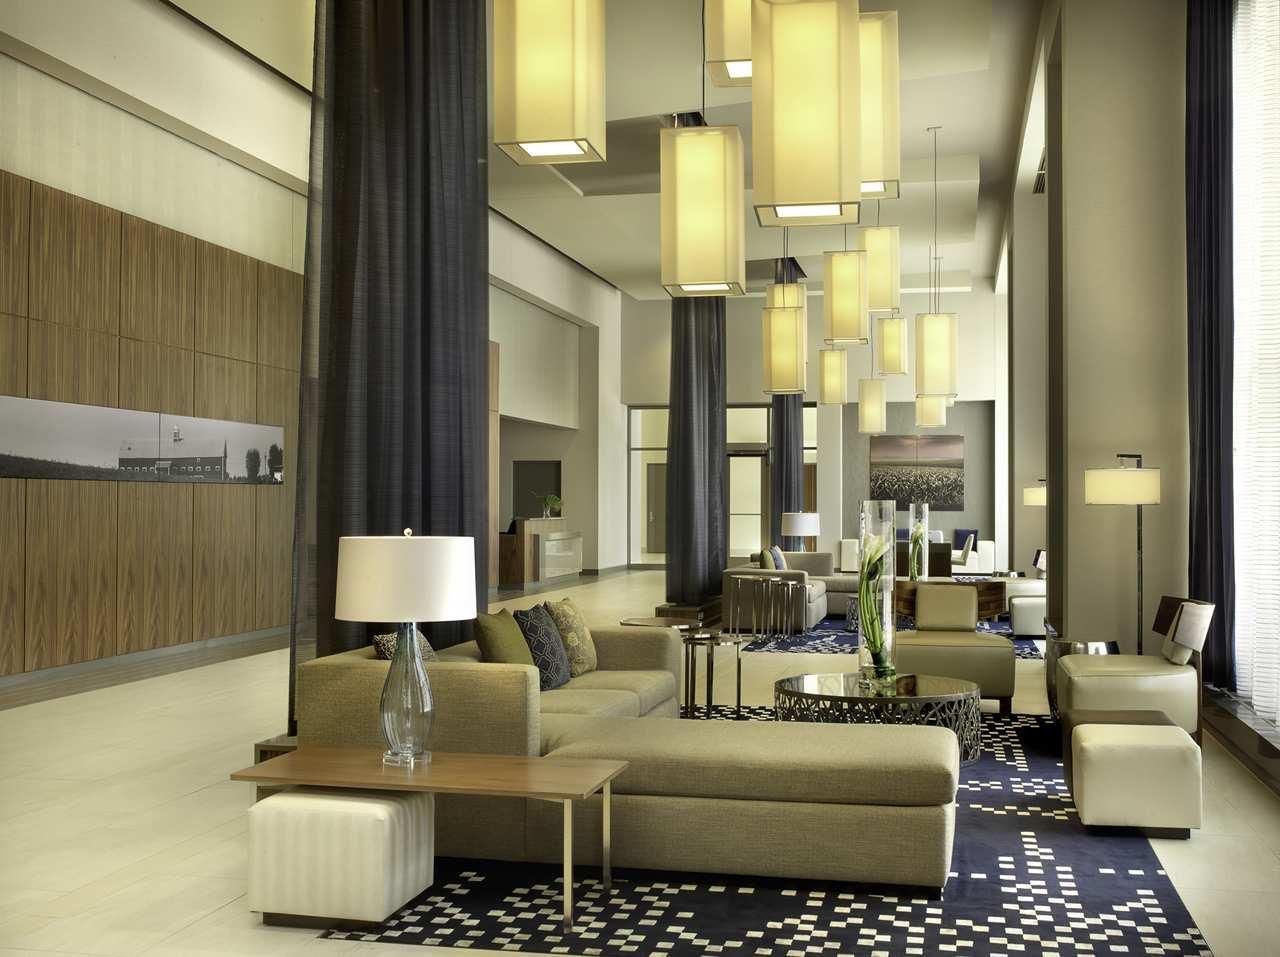 DoubleTree by Hilton Hotel Cedar Rapids Convention Complex image 3